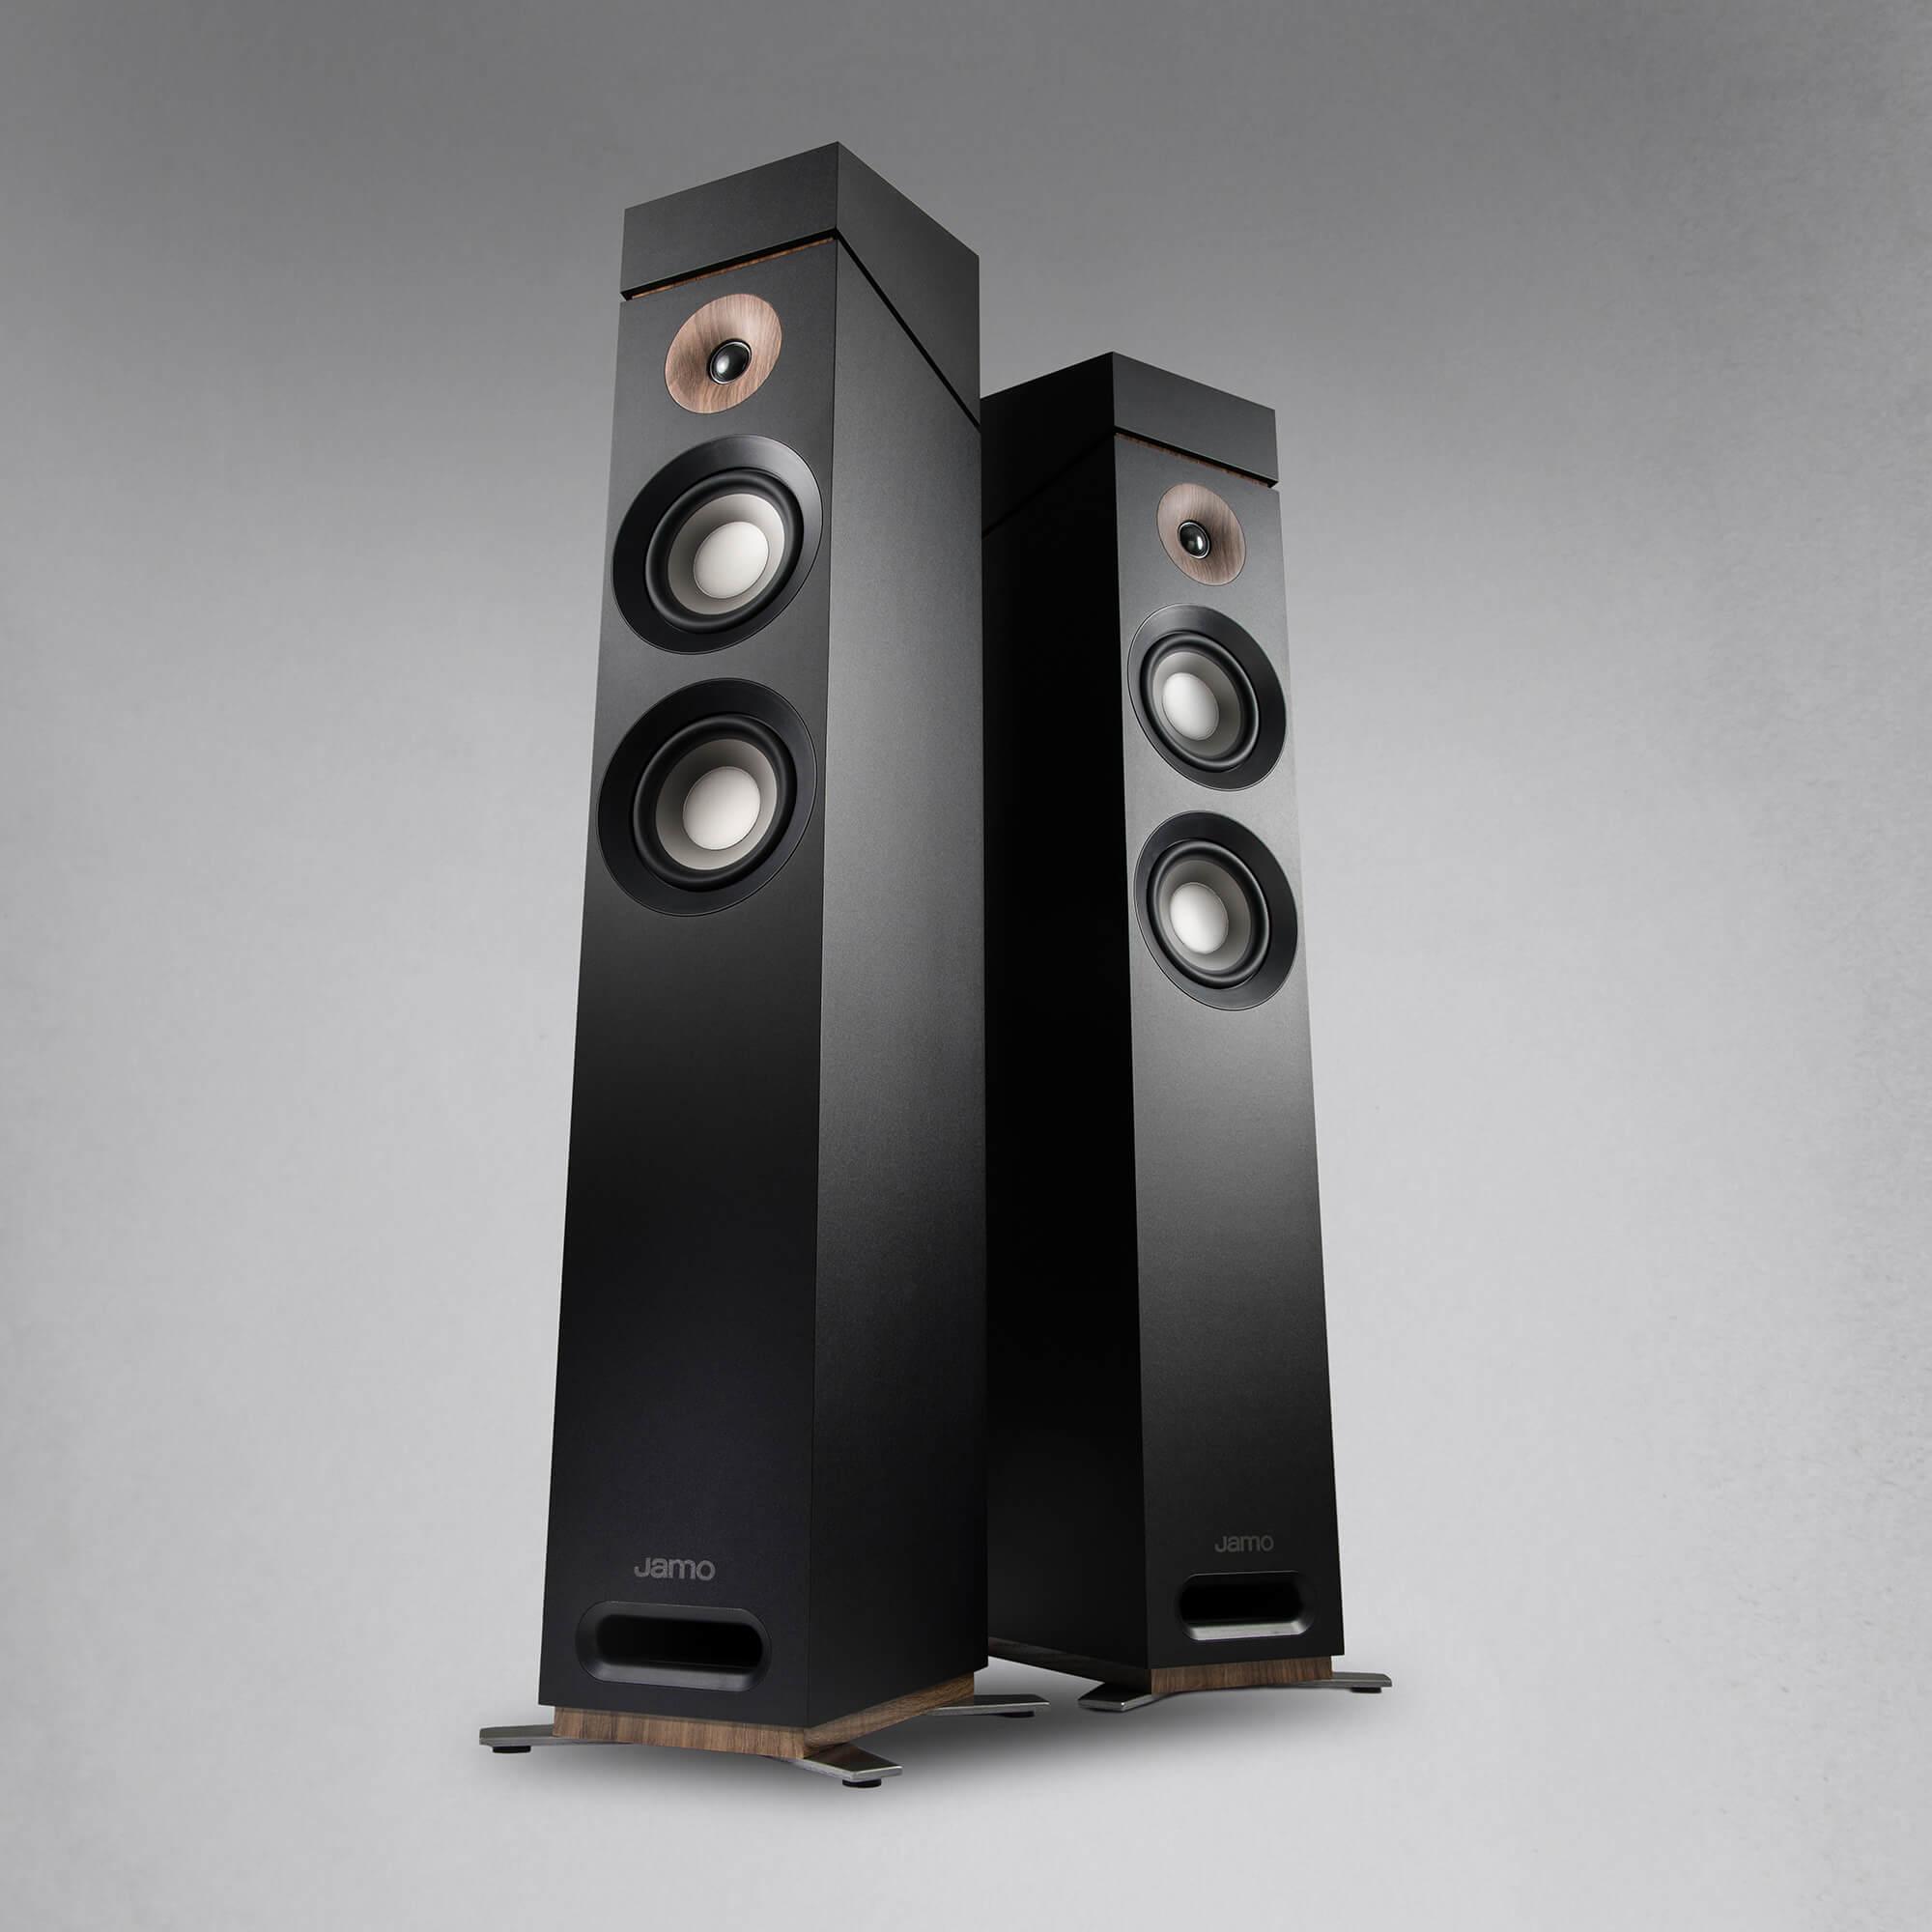 kritisk högtalare jamo-s-807